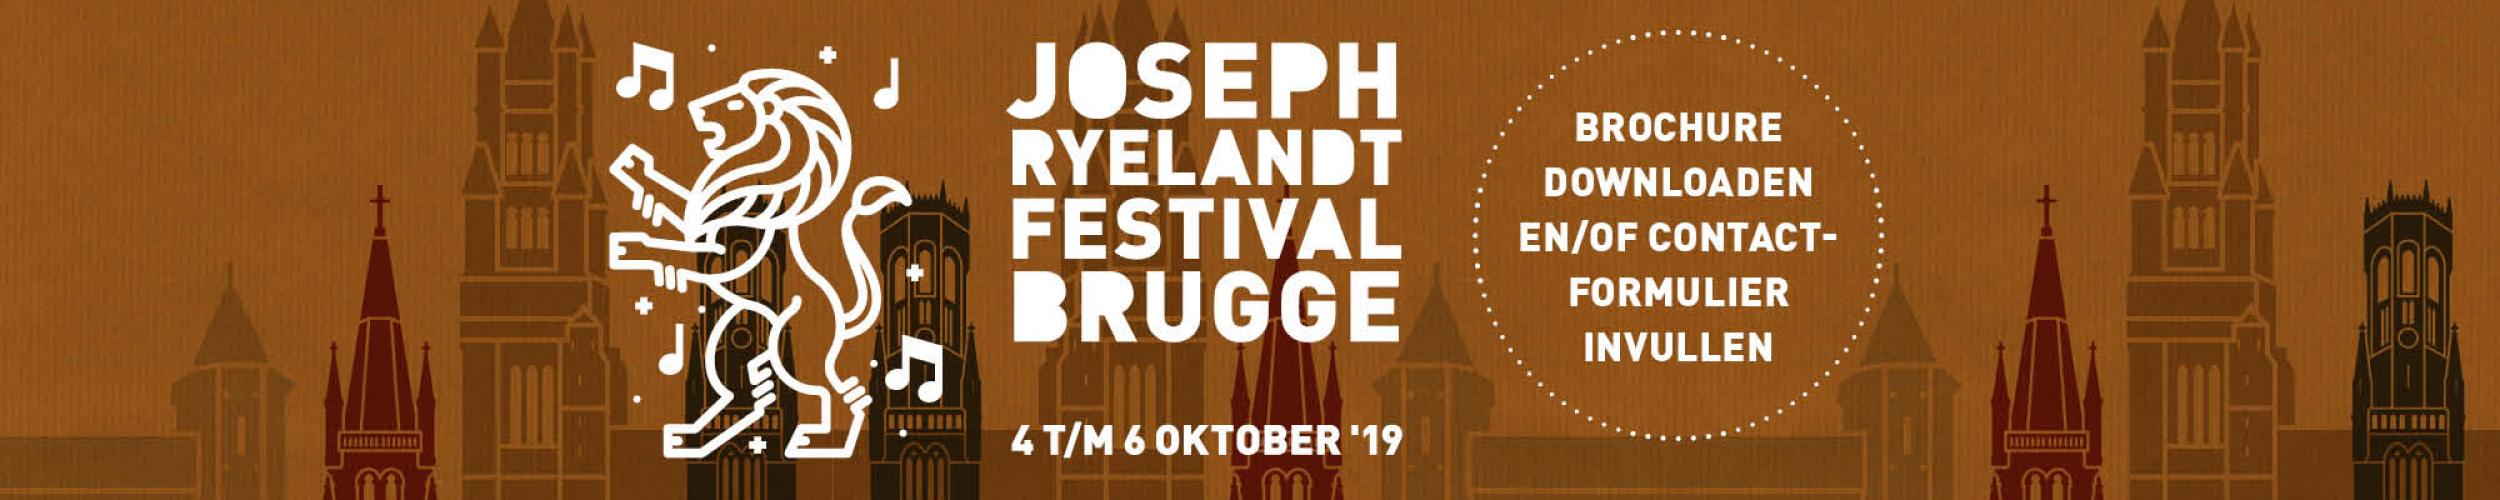 Orpheus Joseph Ryelandt Festival Brugge 2019